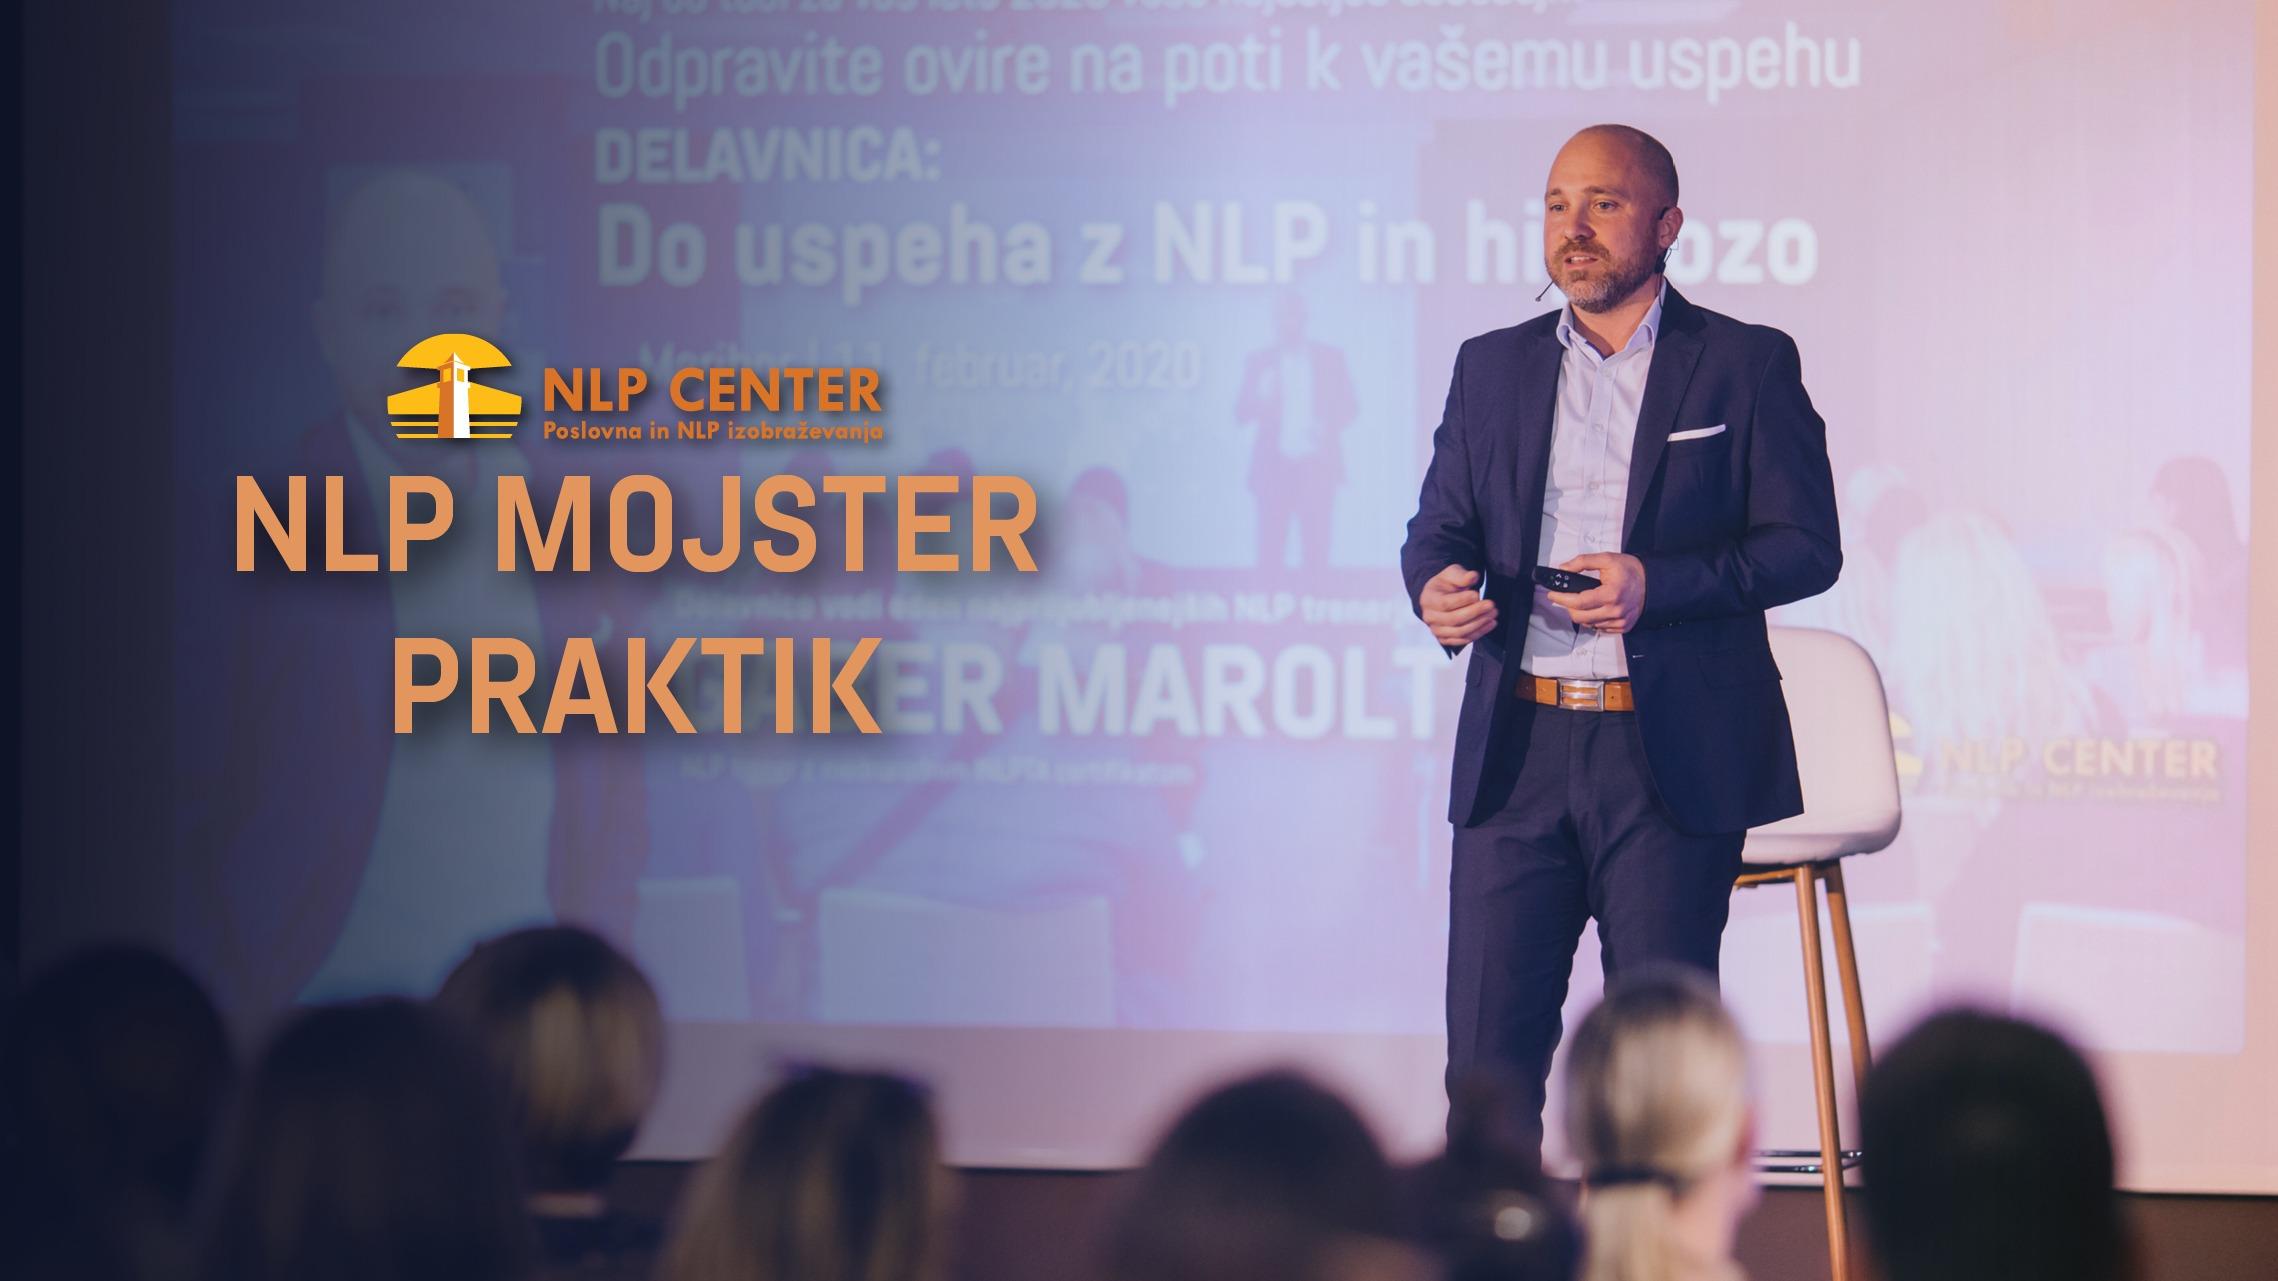 NLP Mojster Praktik - Maribor